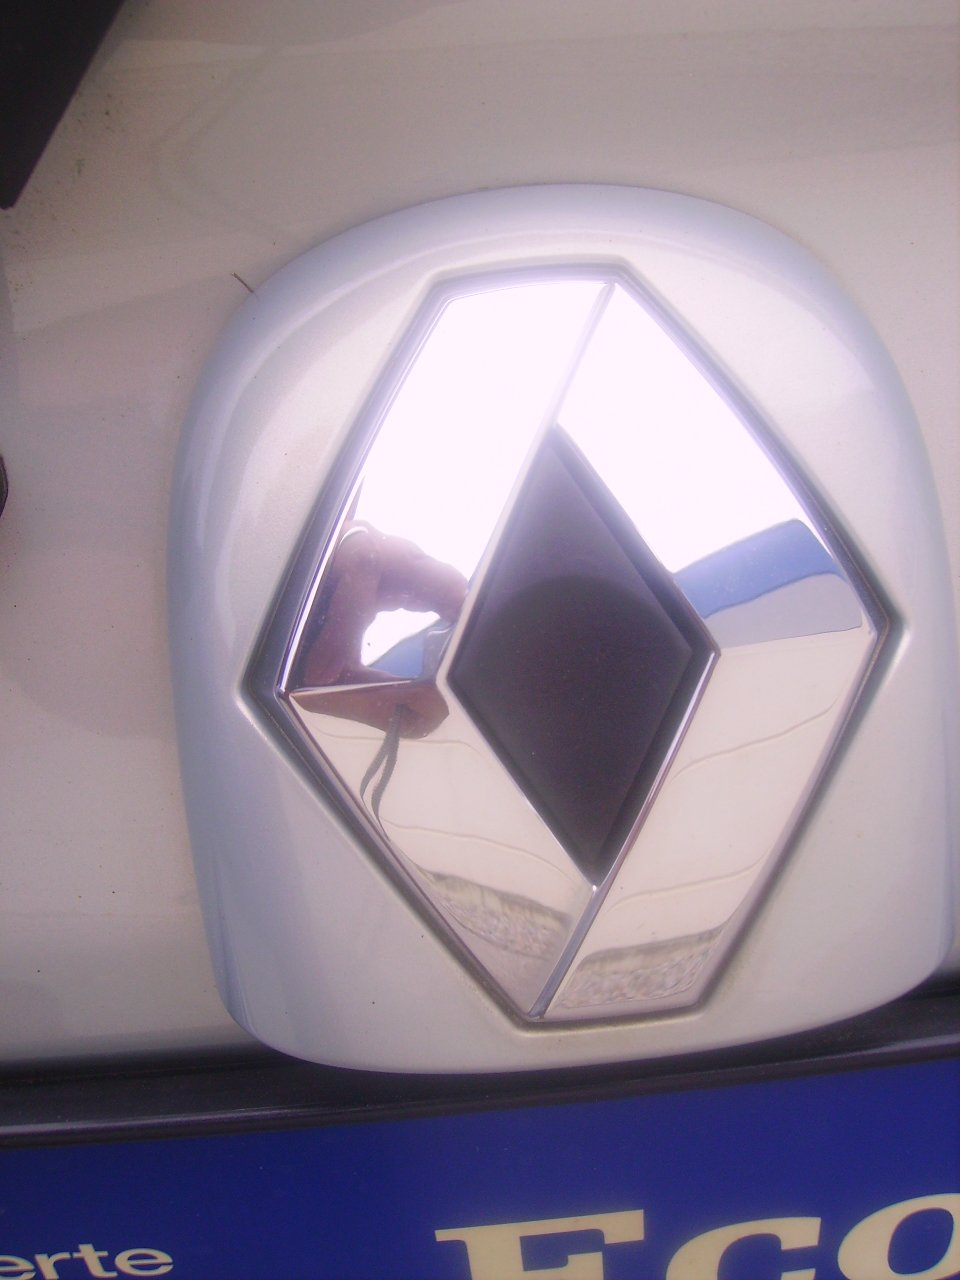 renault-twingo-emblem-logo